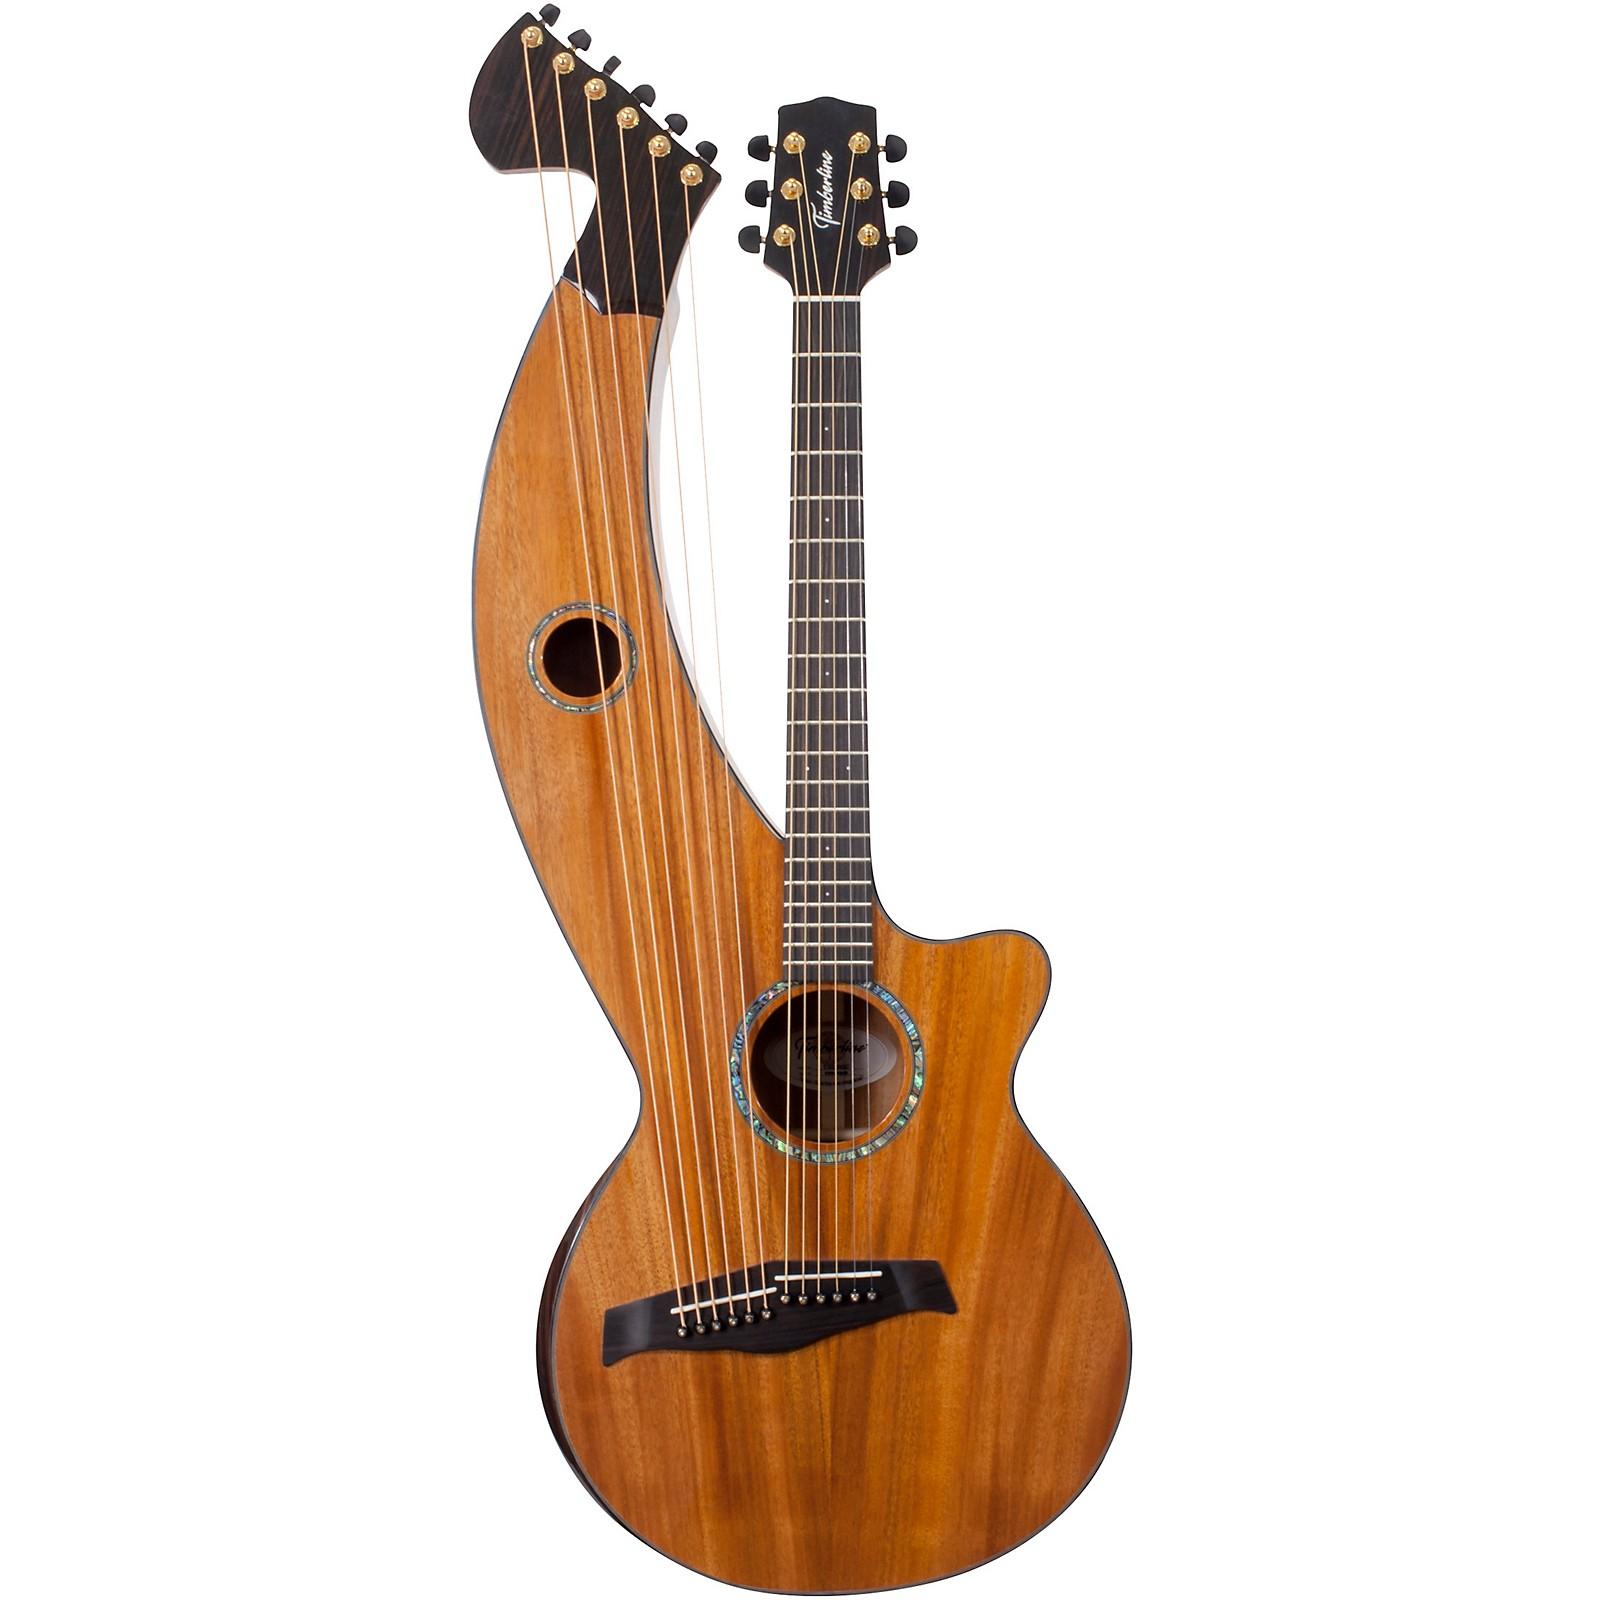 Timberline Guitars T30HGc Solid Tropical Mahogany 12-String Cutaway Acoustic Harp Guitar